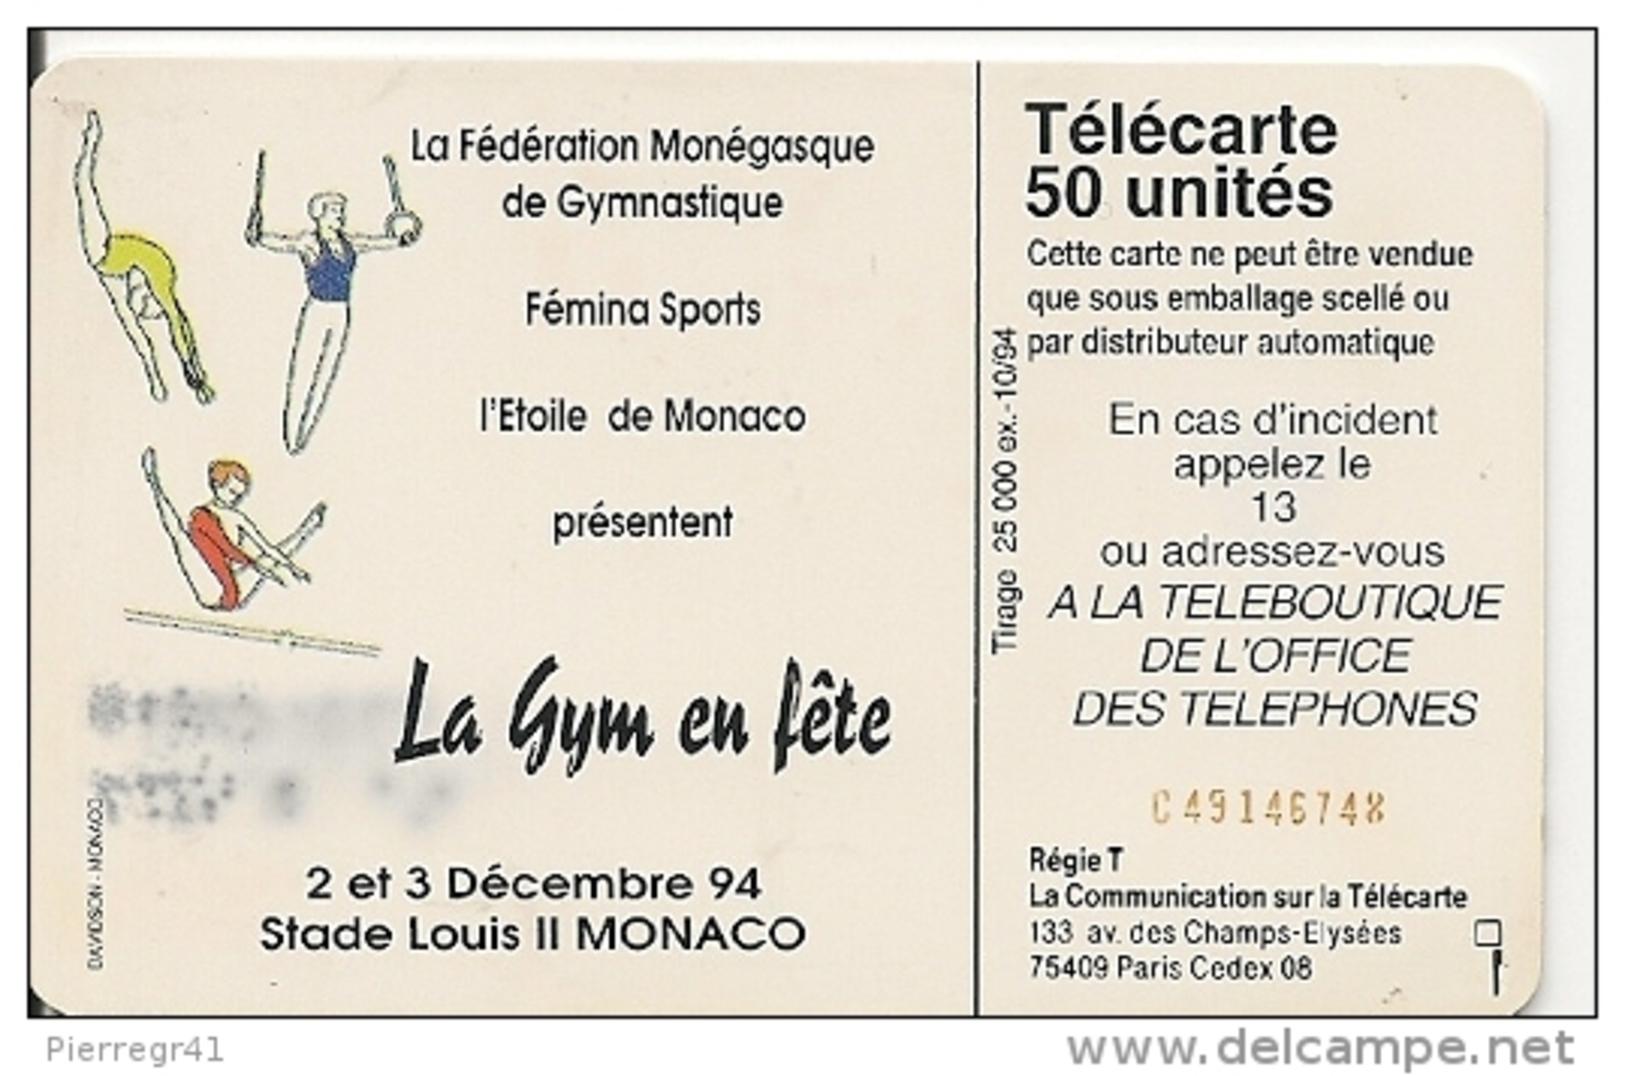 CARTEà-PUBLIC-MONACO-50U-MF32-SC7-10/94-GALA GRACE GYM-V° Rge C491467747-UTILISE-BE - Monaco